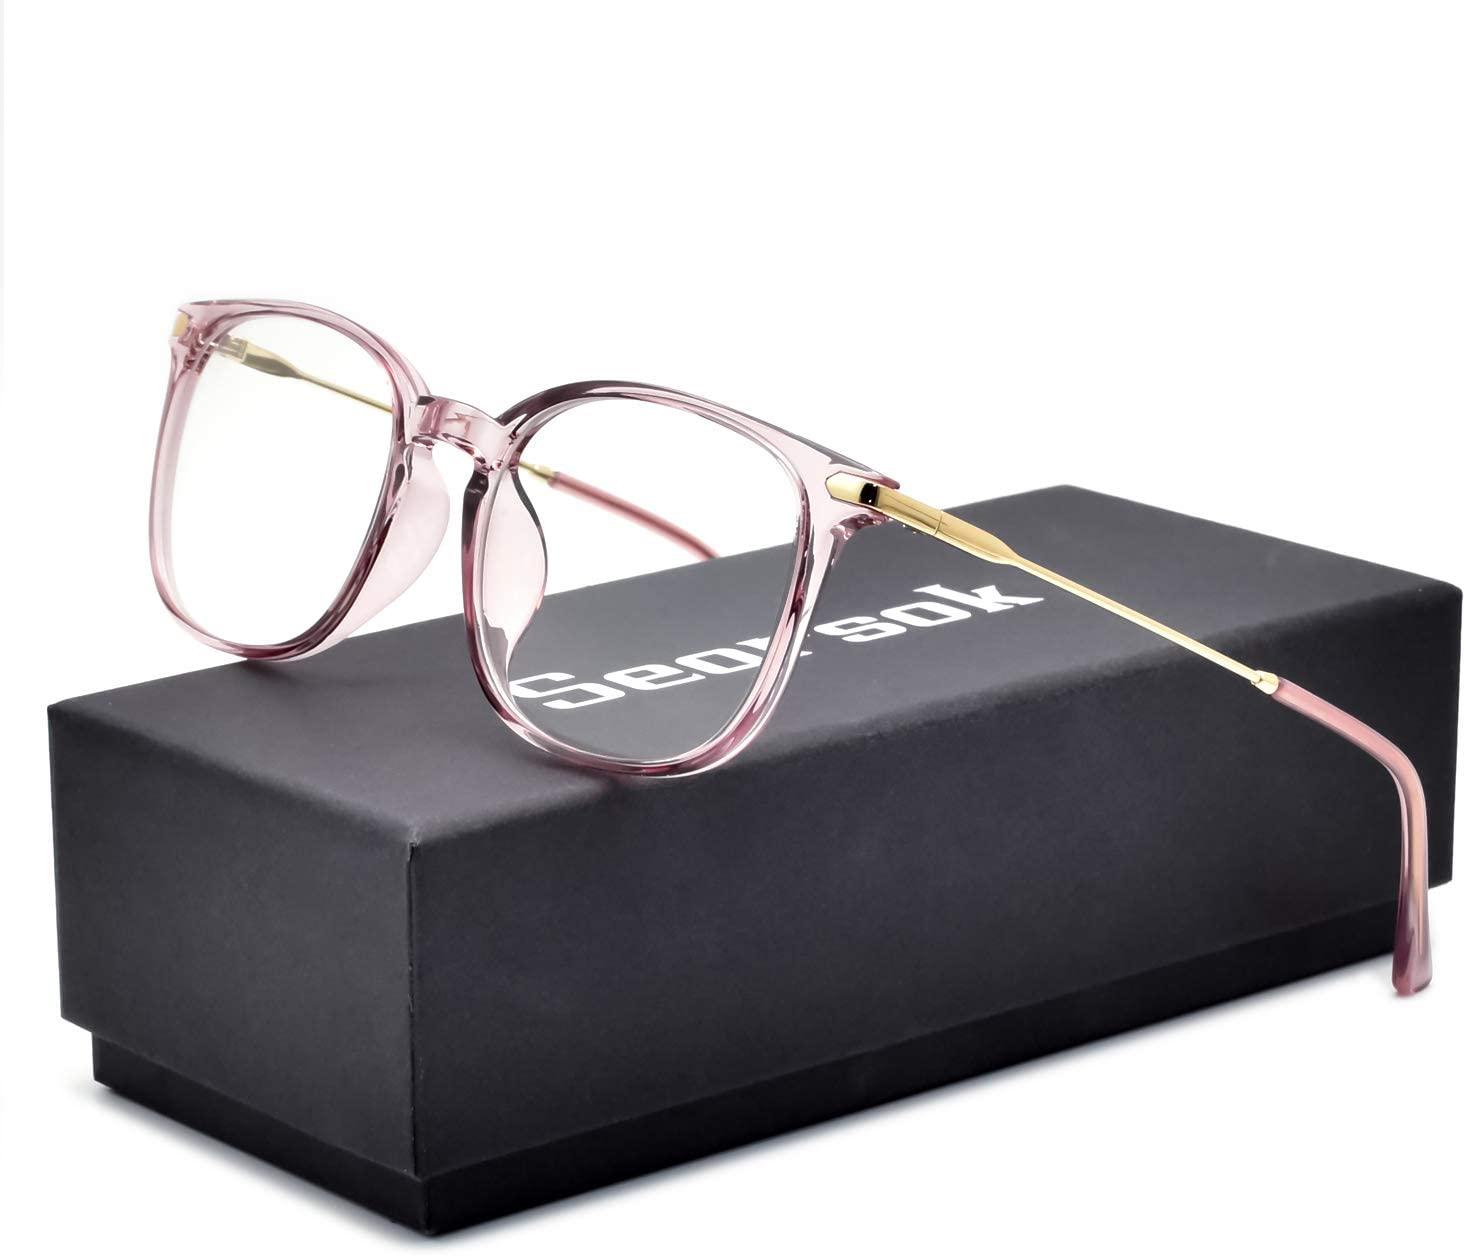 Seorsok Blue Light Blocking Glasses Computer Gaming for Women Men TR90 Lightweight Flexible Frame, Anti-Glare to Protect Eyesight-Transparent Pink